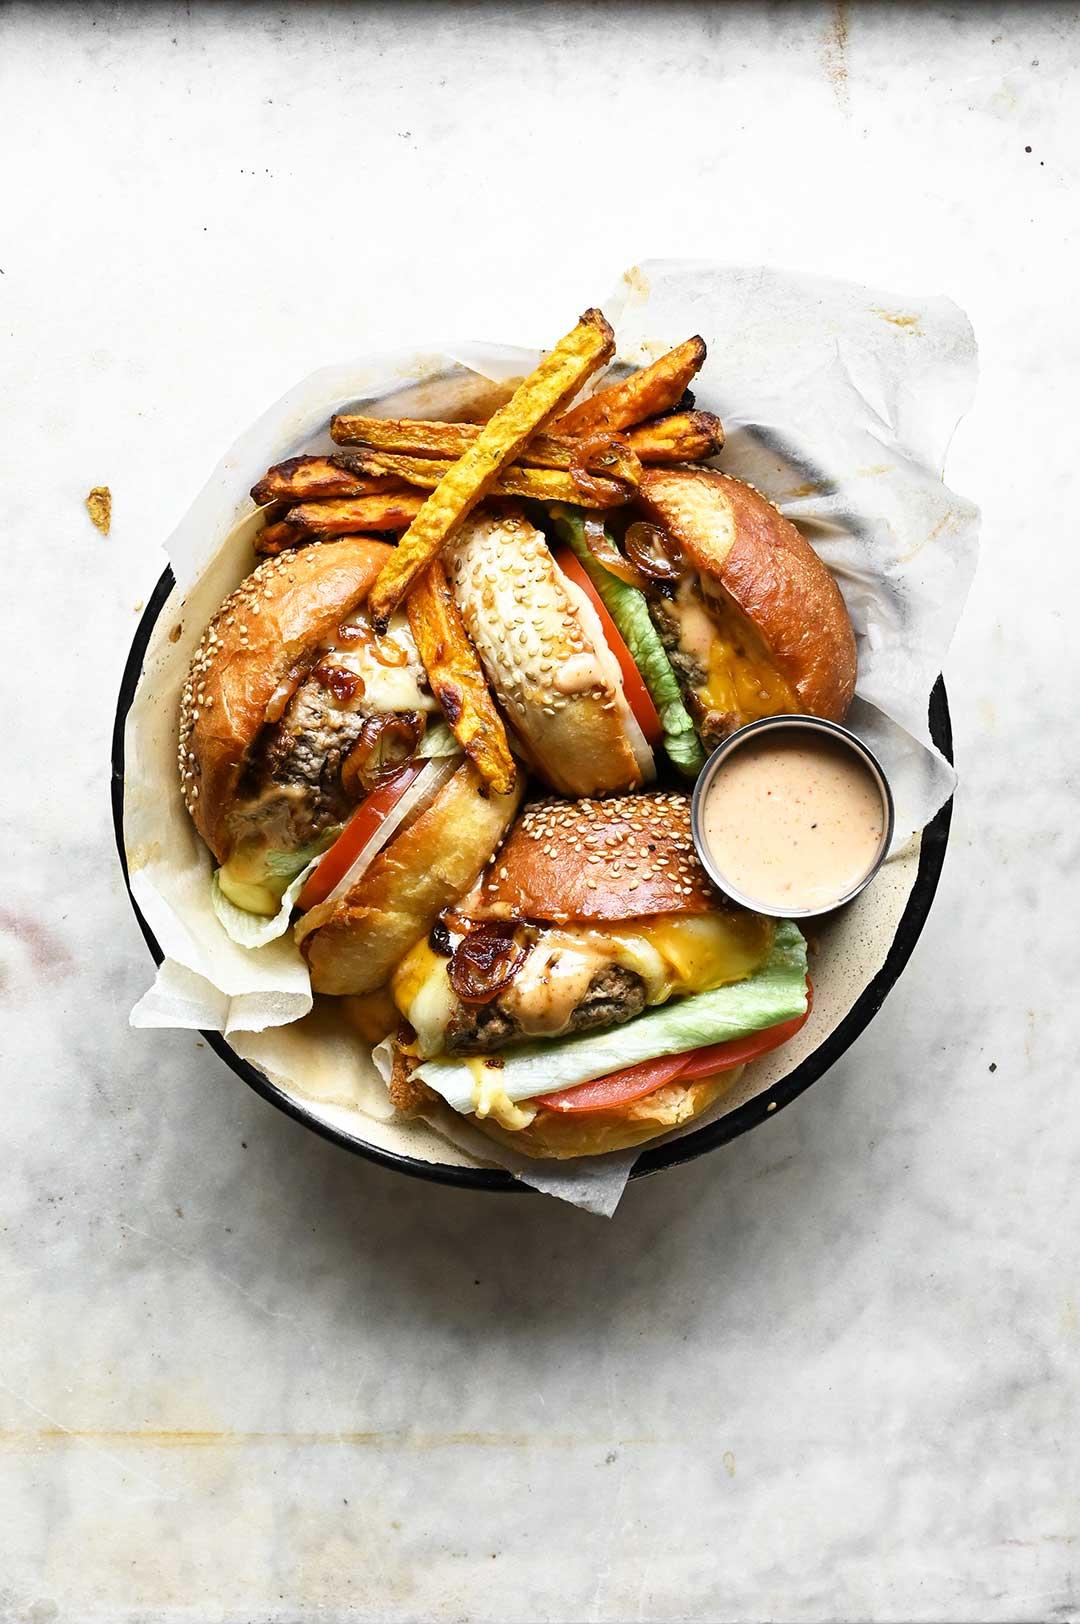 serving dumplings | Juicy cheeseburger with jalapeño sauce and sweet potato fries